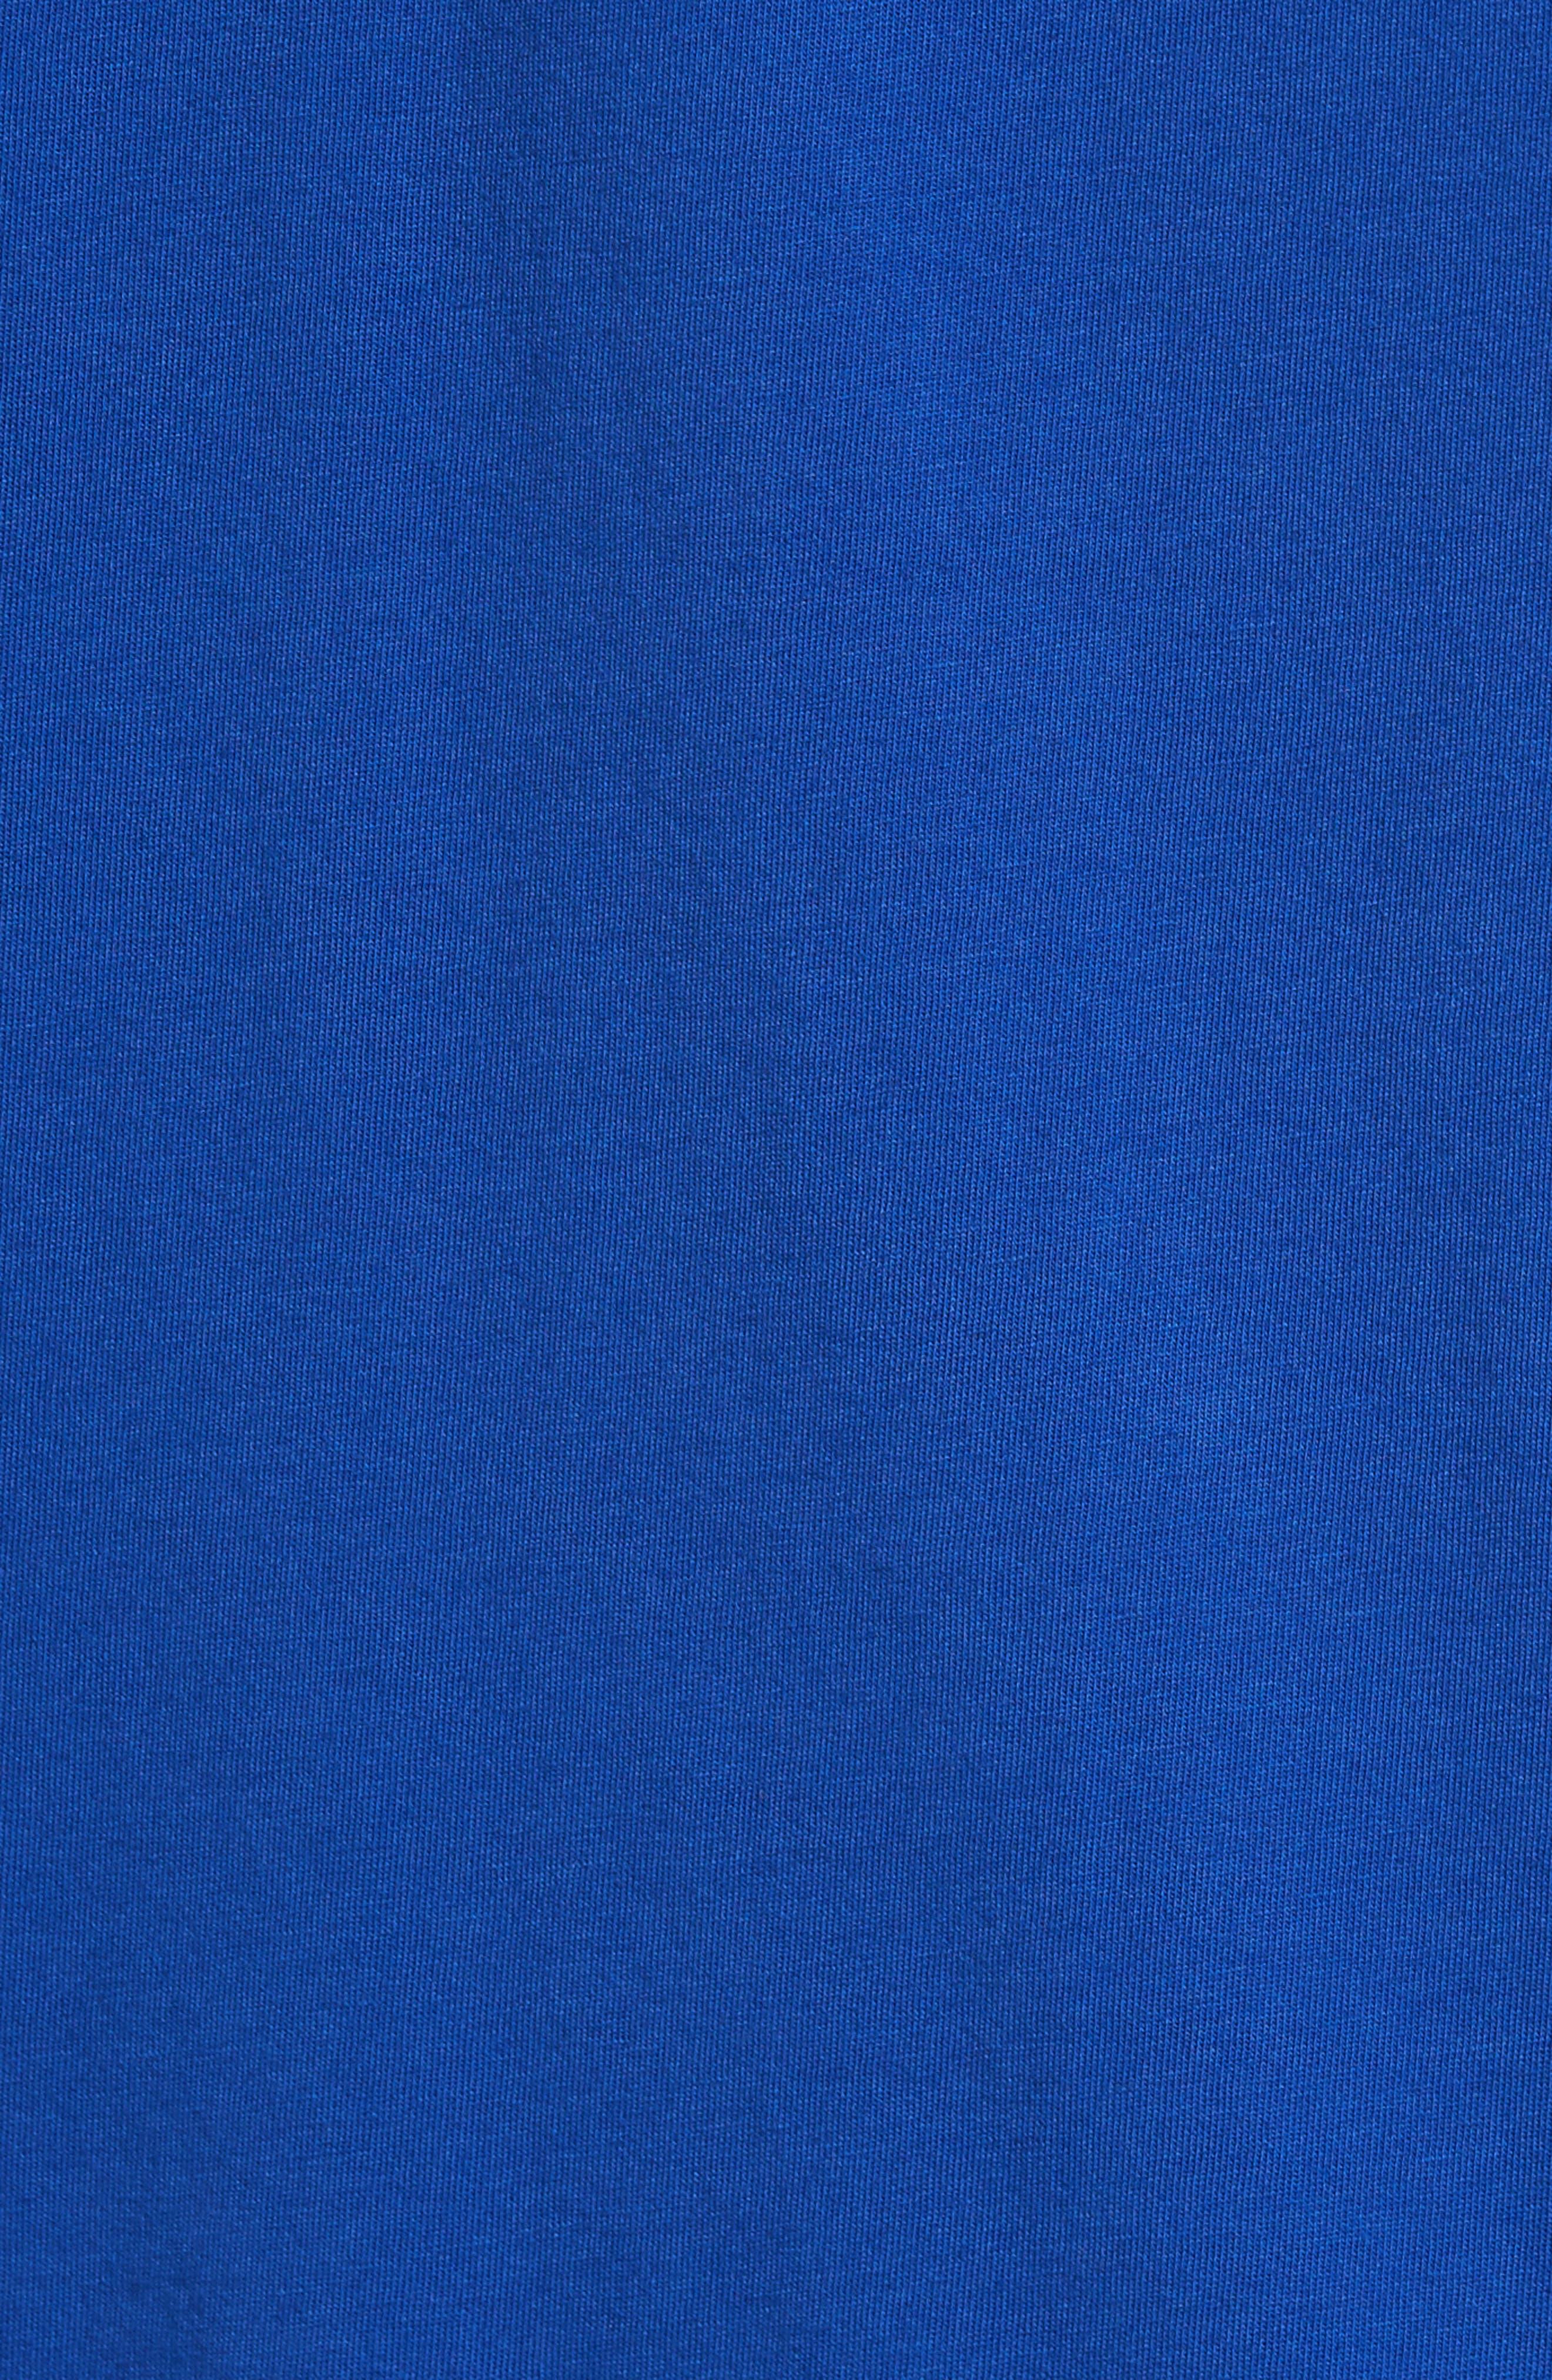 Classic Fit Pocket T-Shirt,                             Alternate thumbnail 5, color,                             413